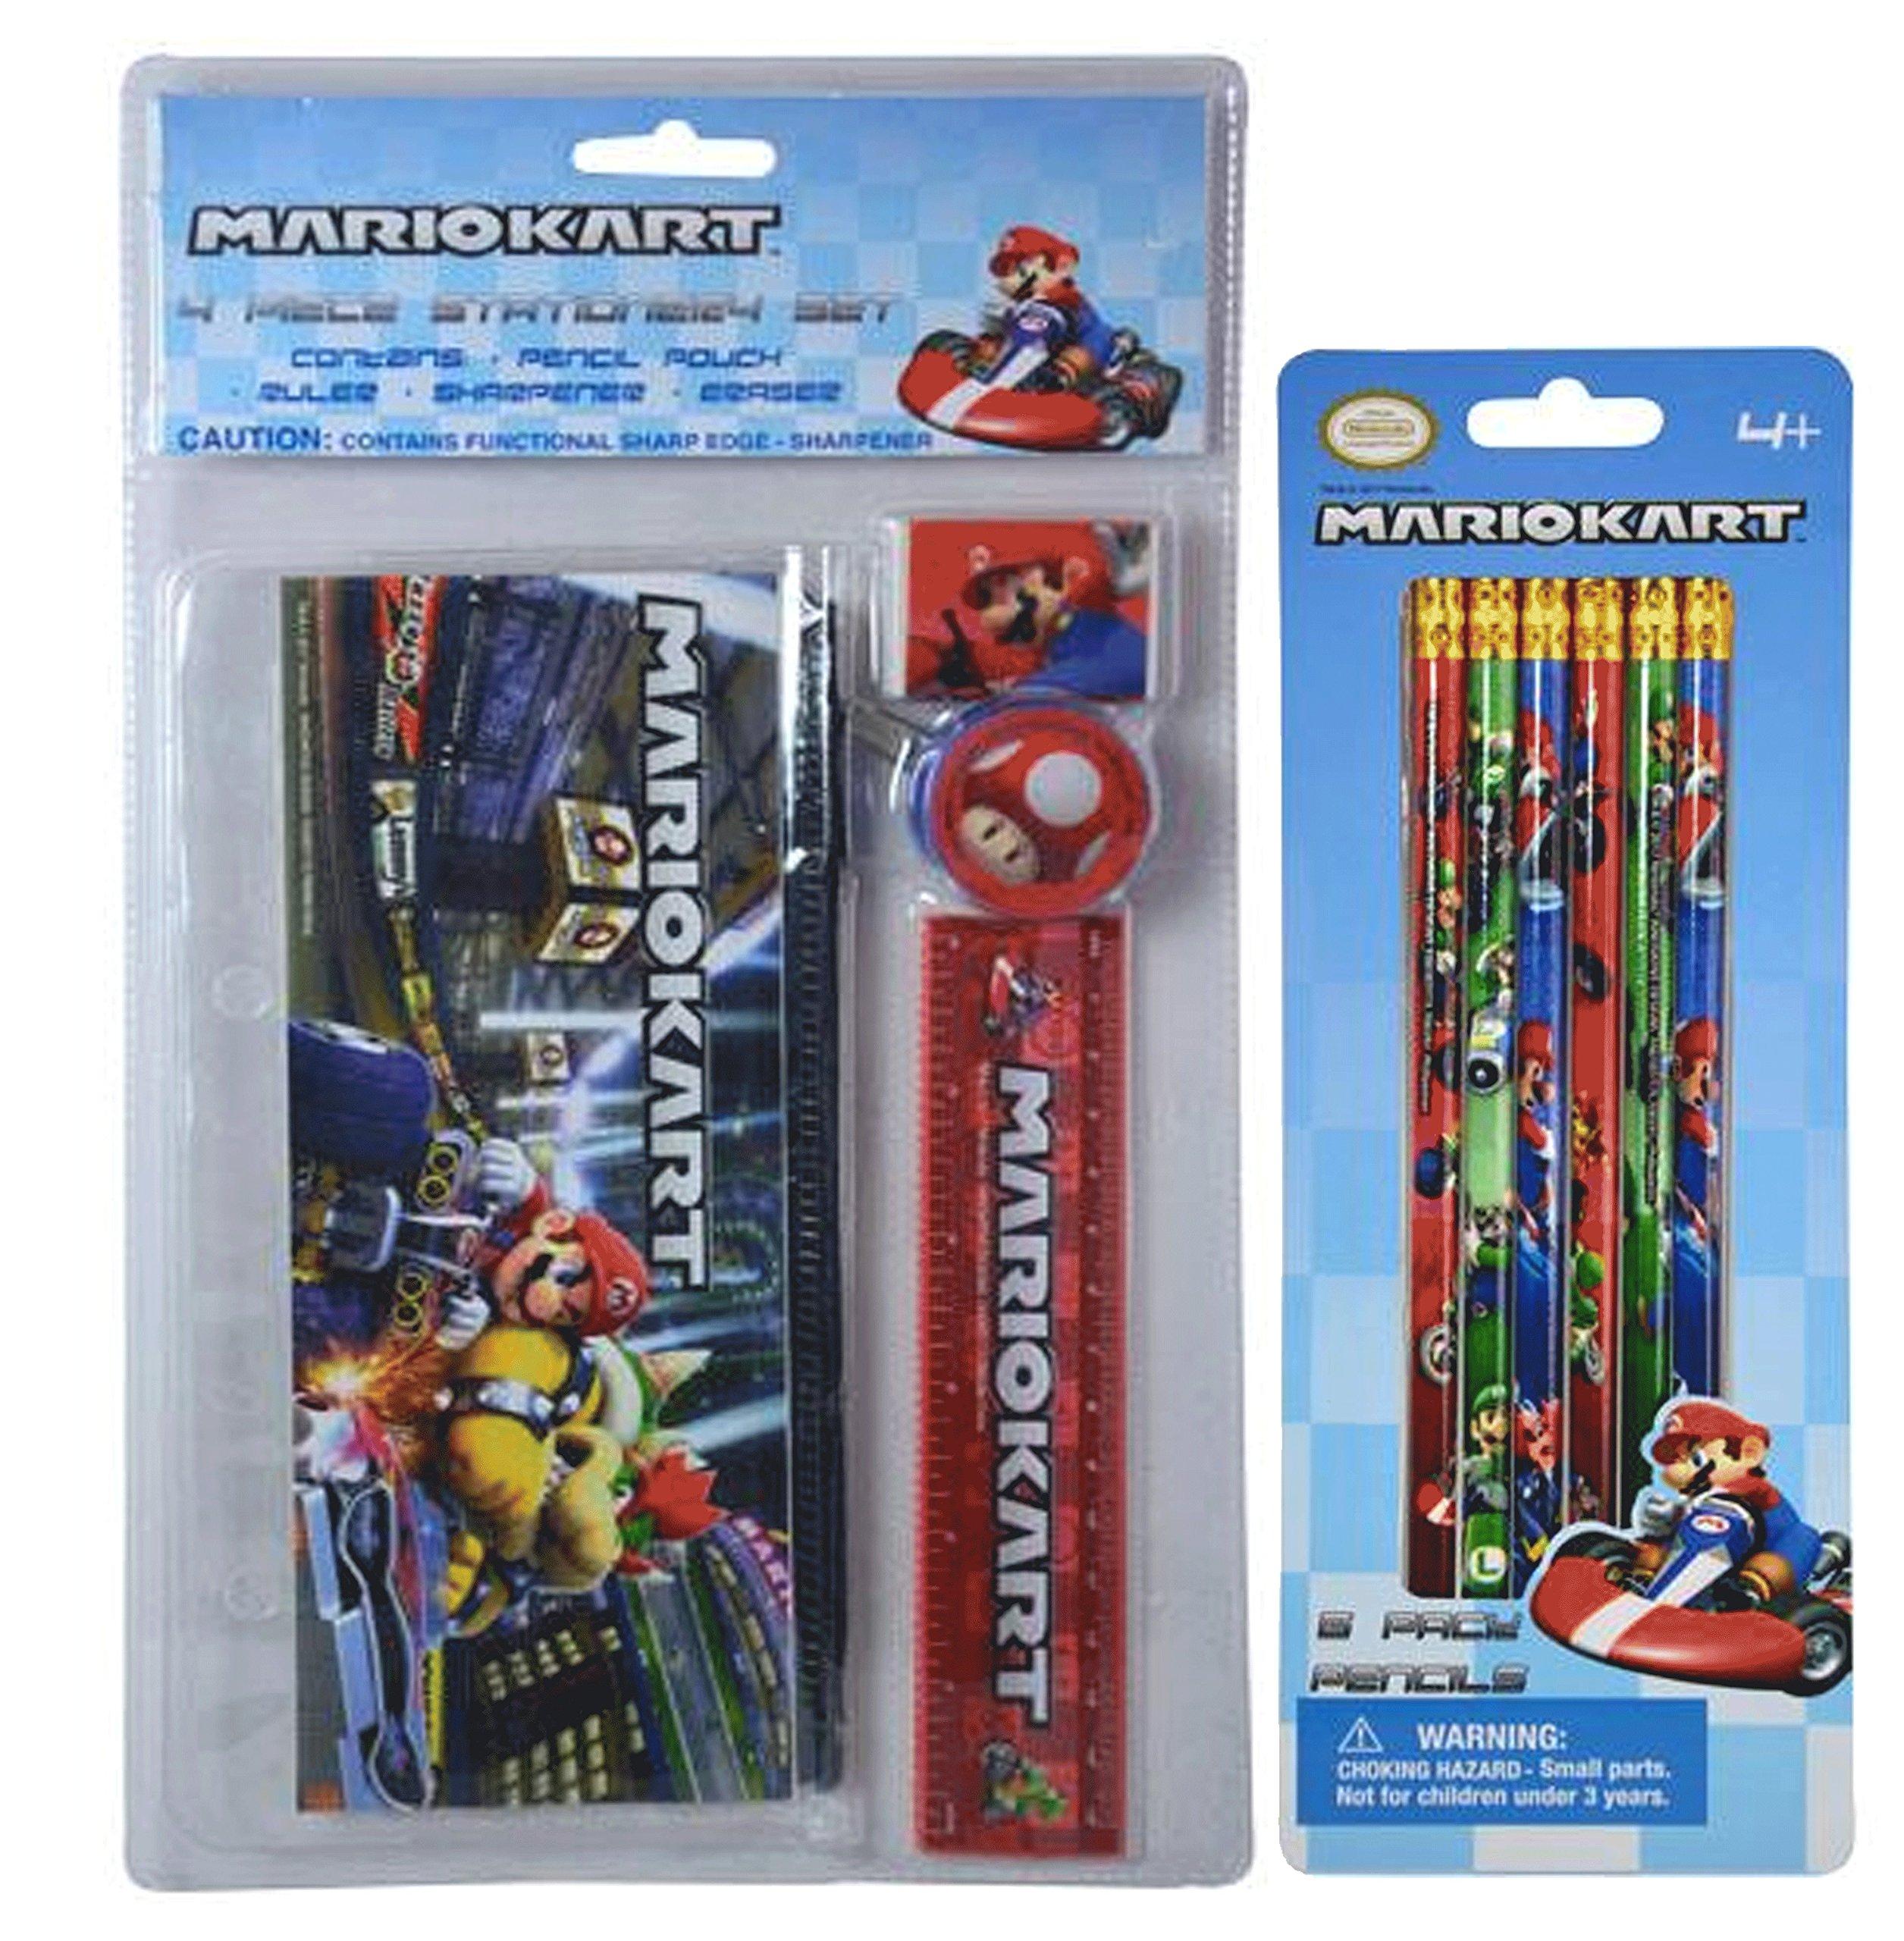 Super Mario Brothers MarioKart 10pc School Supplies Bundle! Includes 6pk Pencils, Pencil Pouch, Ruler, Sharpener & Eraser!